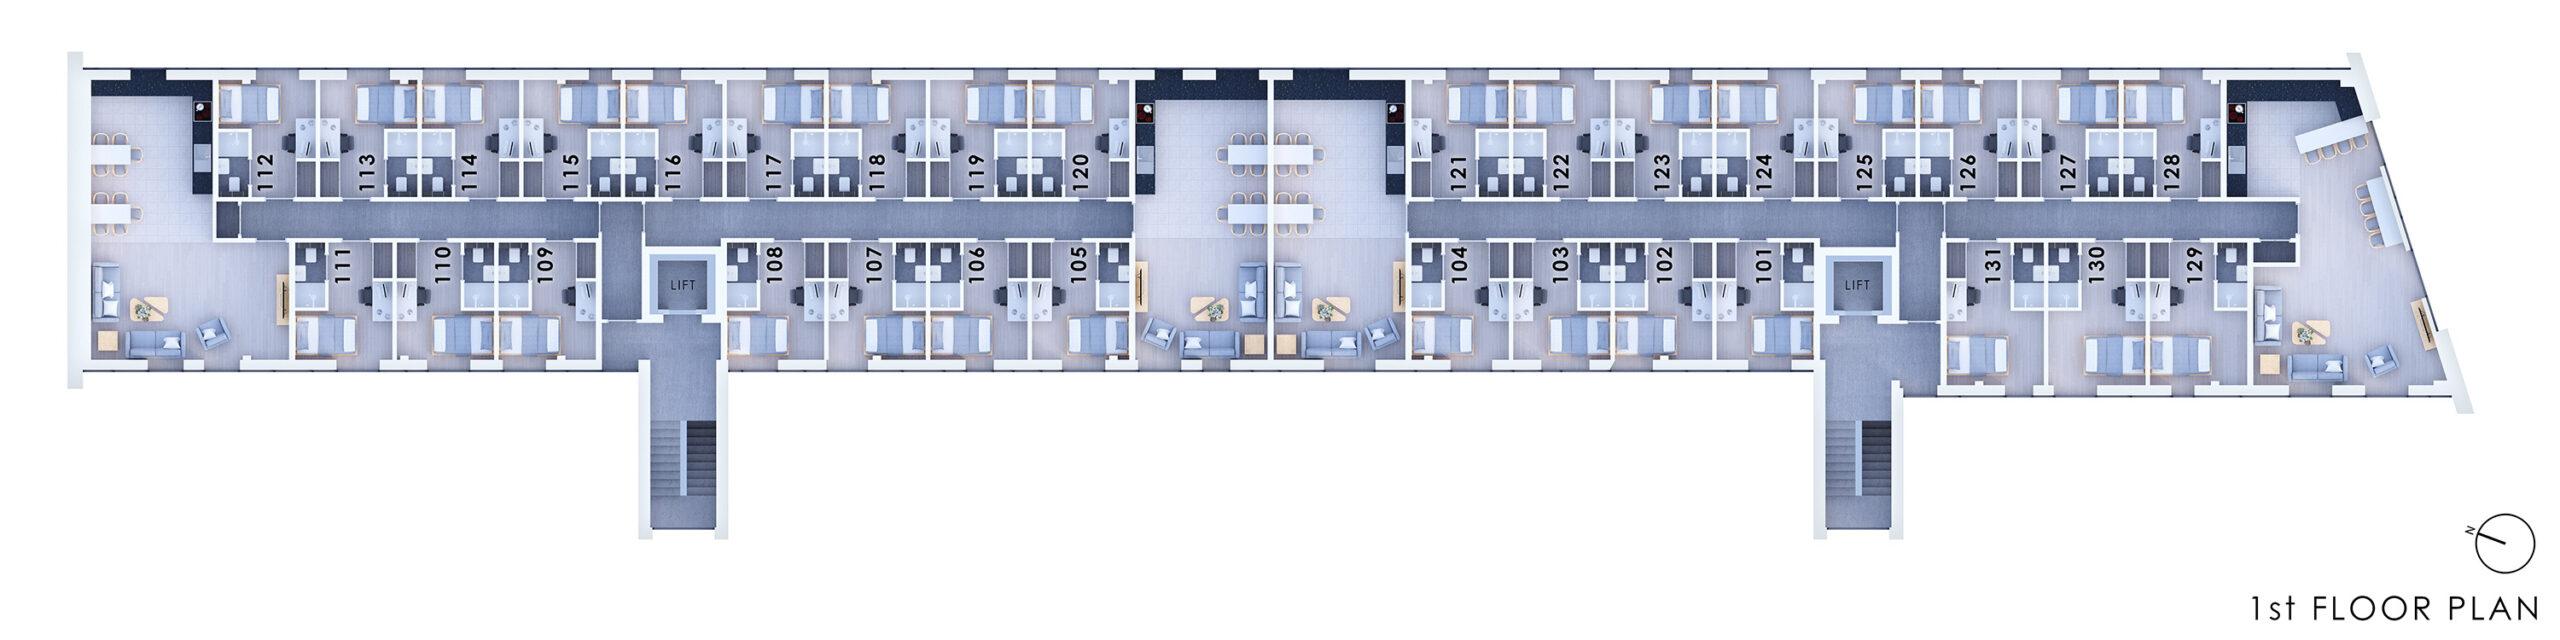 City Point 1st Floor Plan